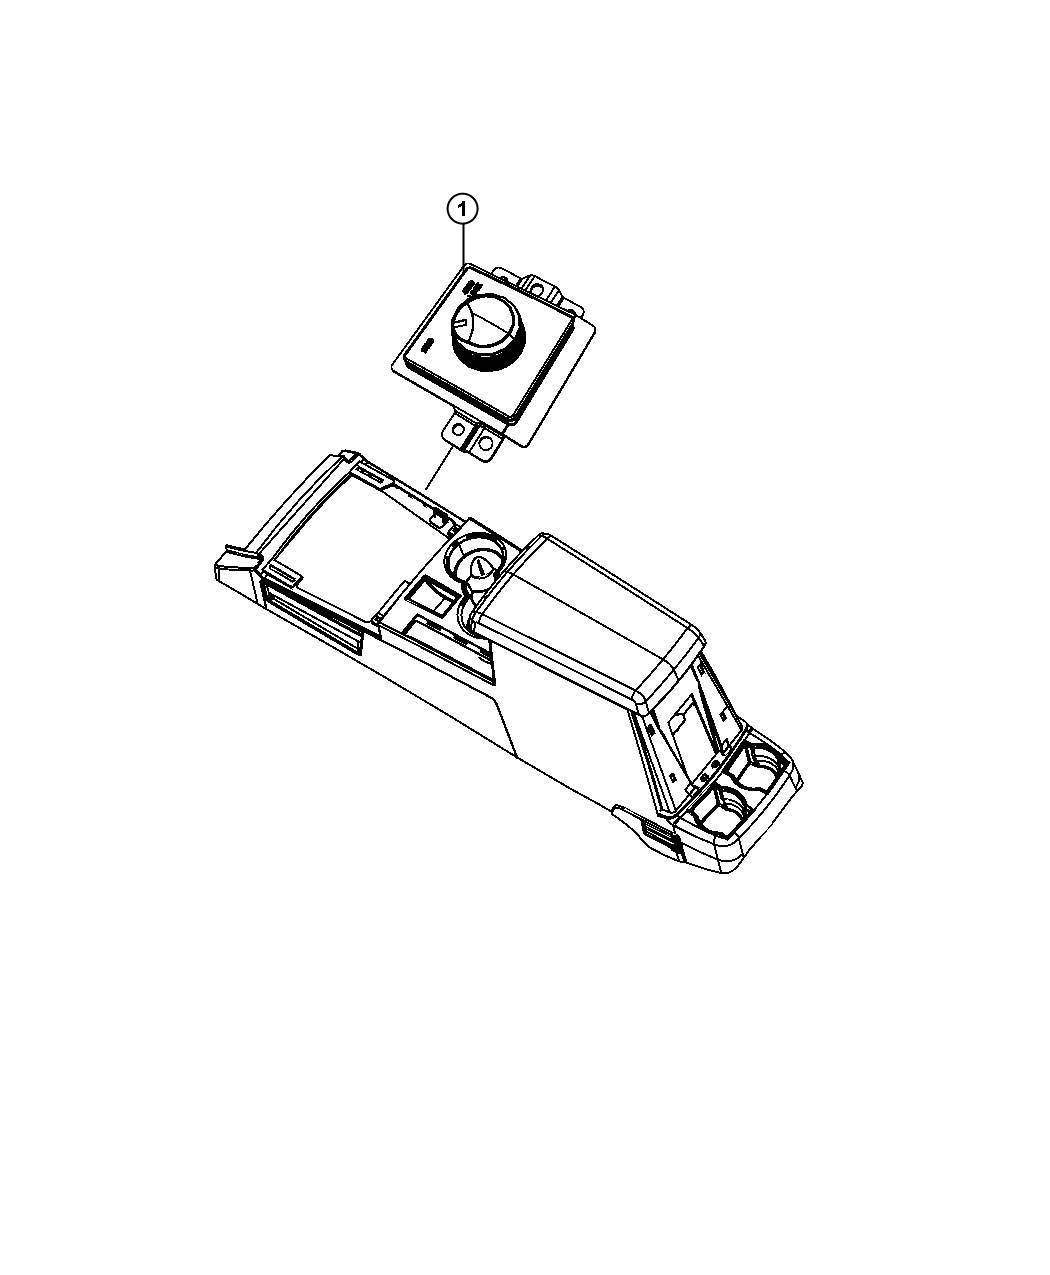 2011 Jeep Liberty Switch. Transfer case. [command trac ii